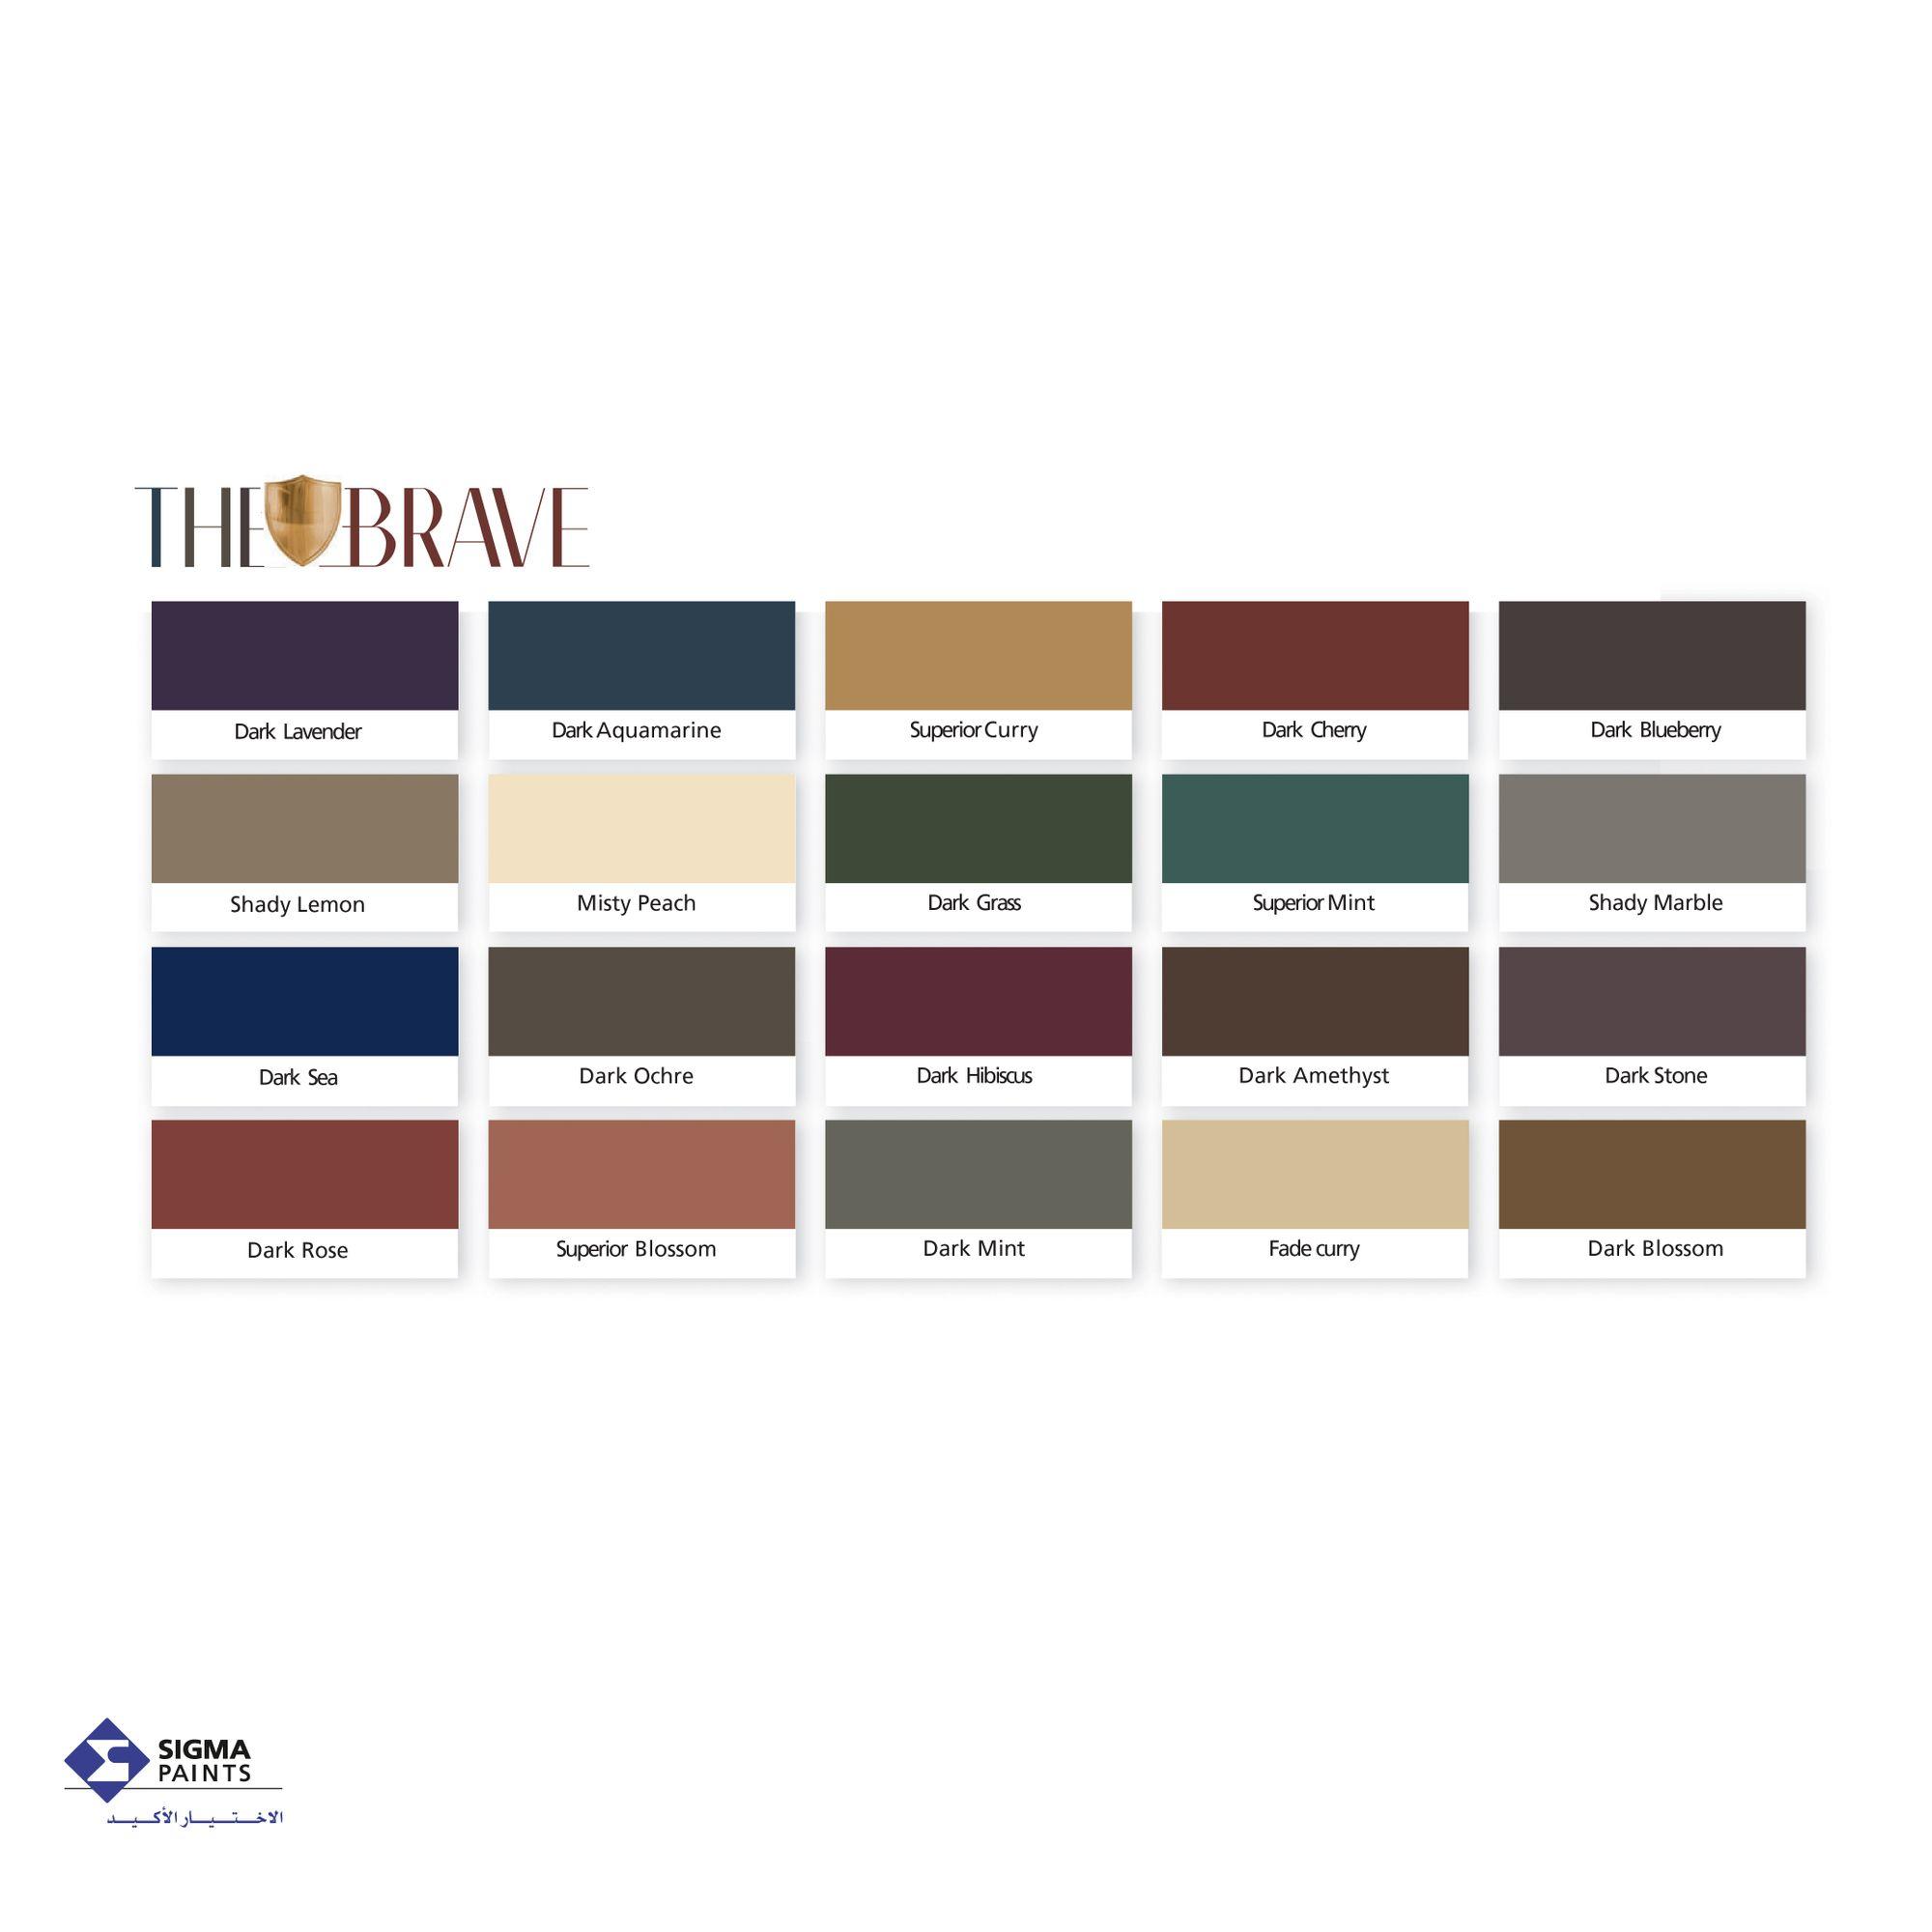 طريقة تنسيق الملابس مع الألوان المناسبة Color Combinations For Clothes Colour Combinations Fashion Color Blocking Outfits